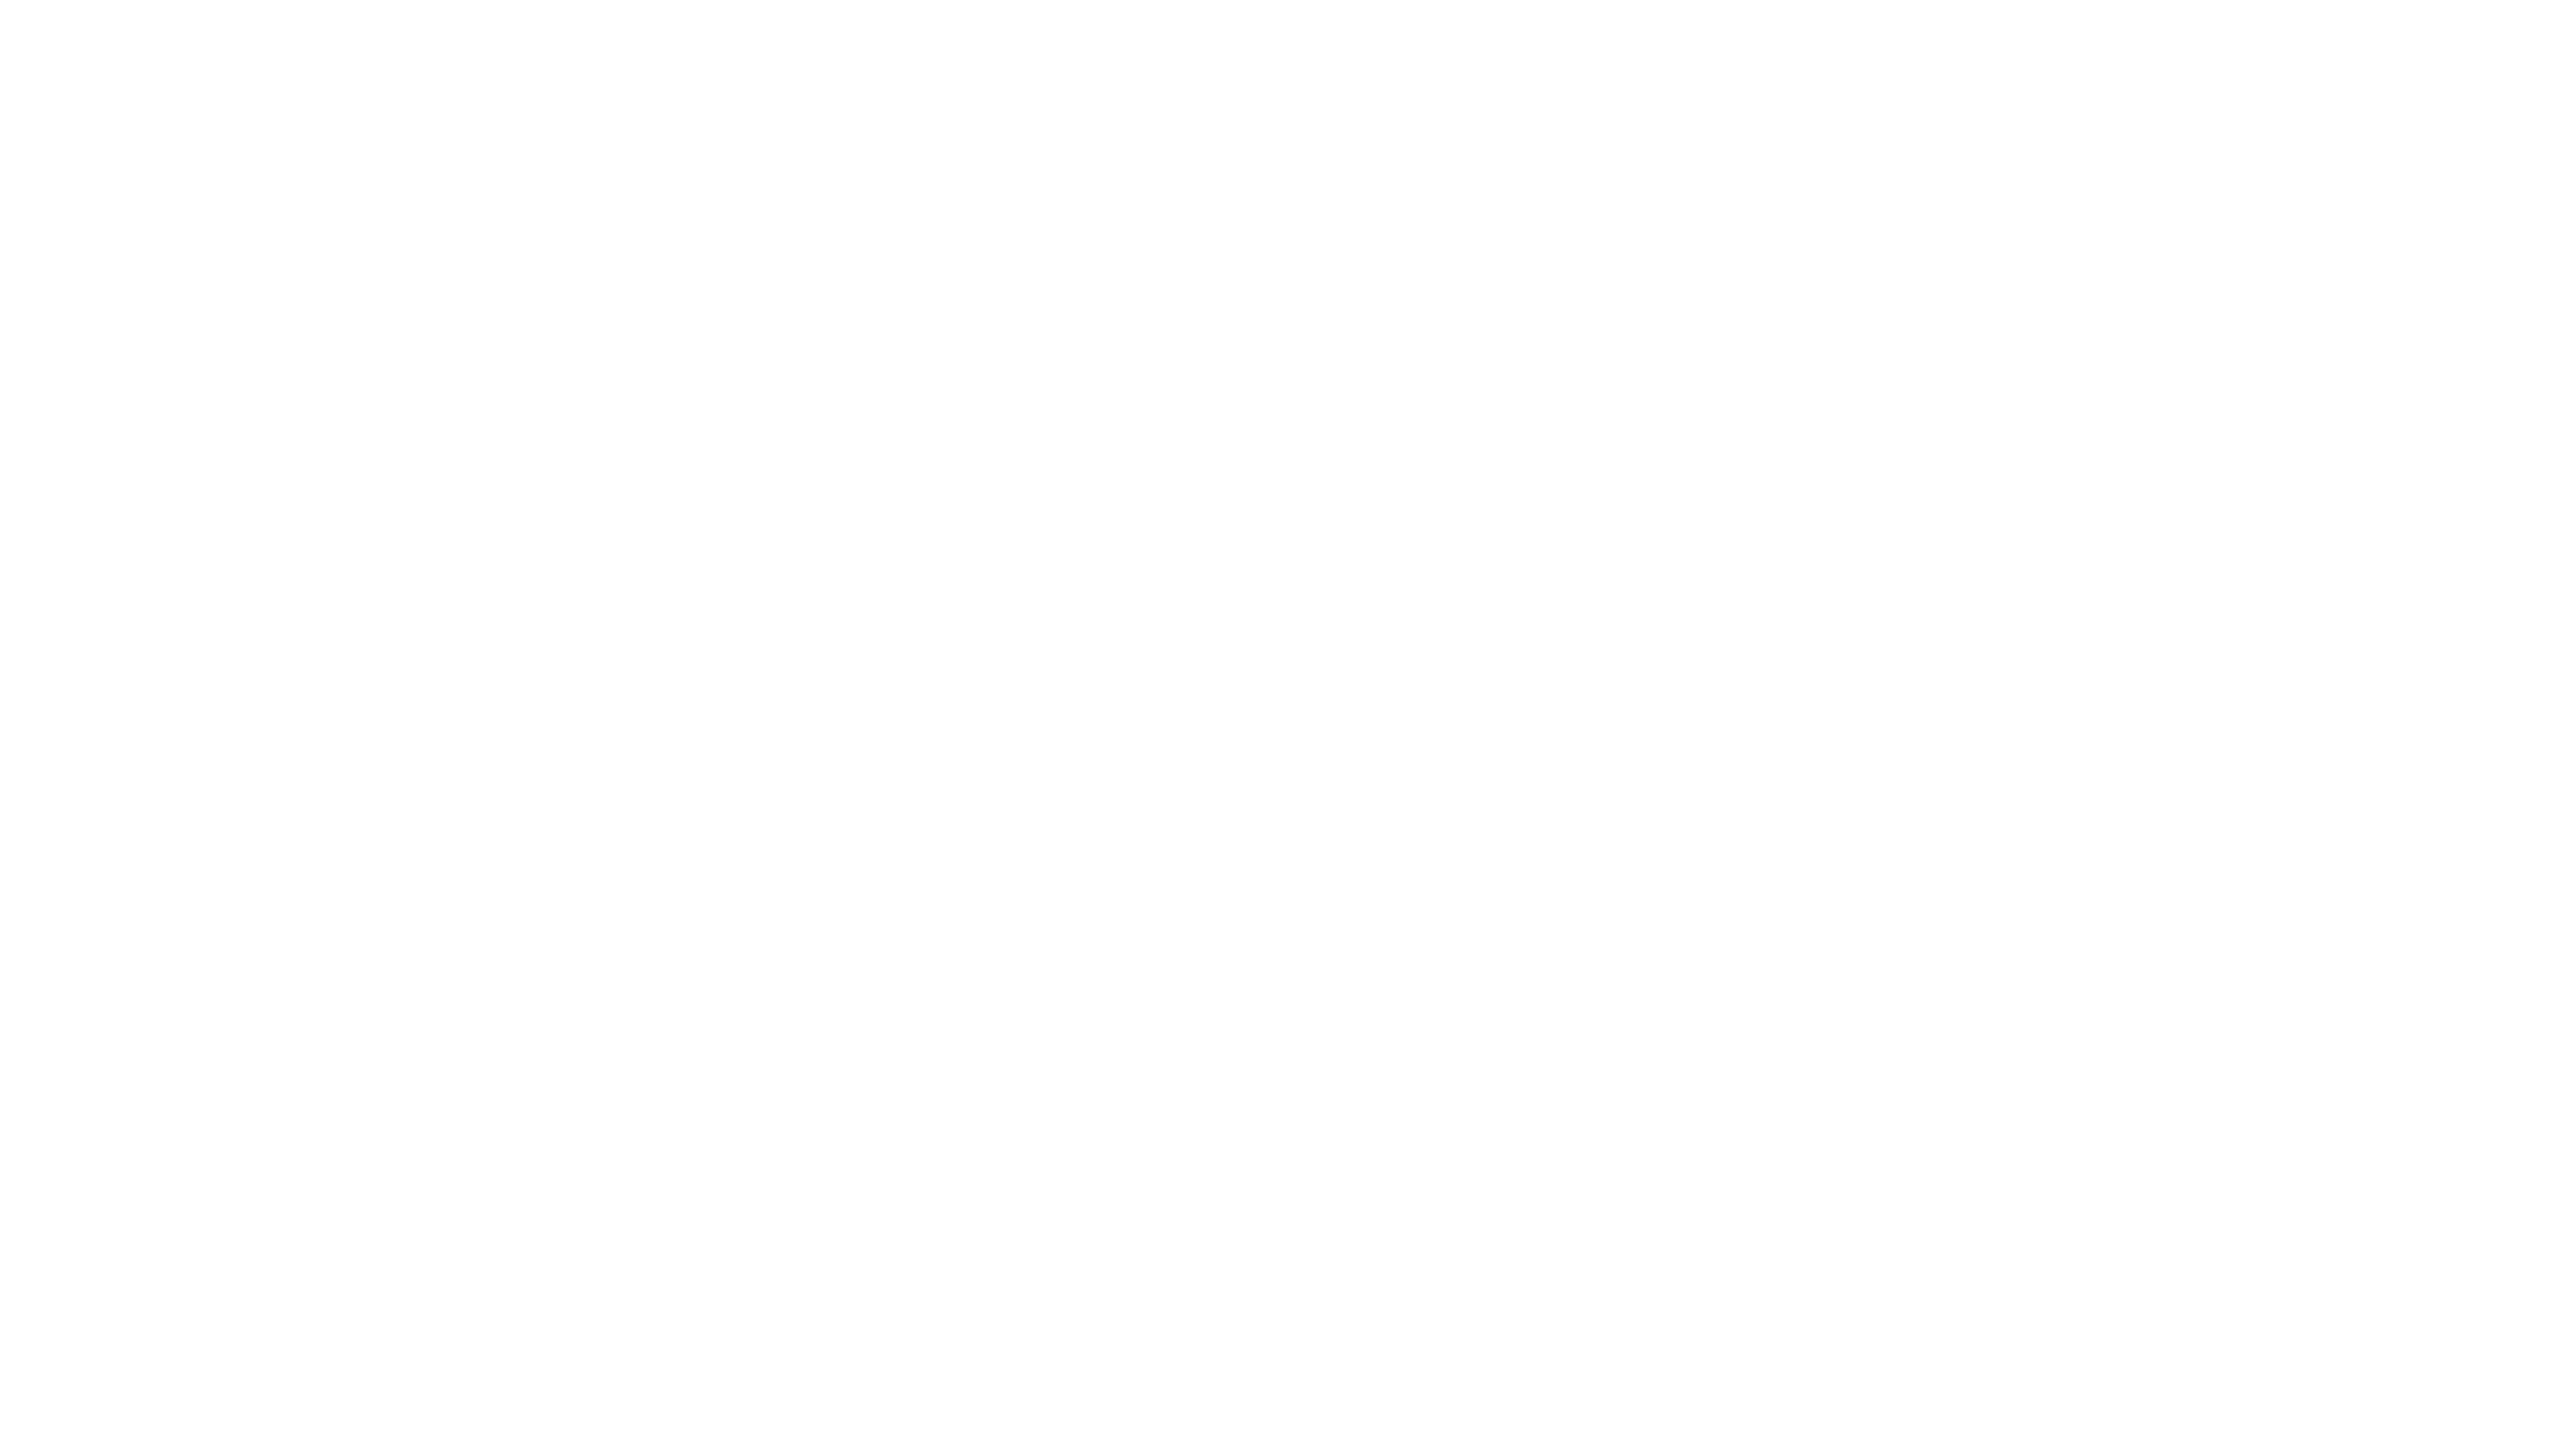 12:03